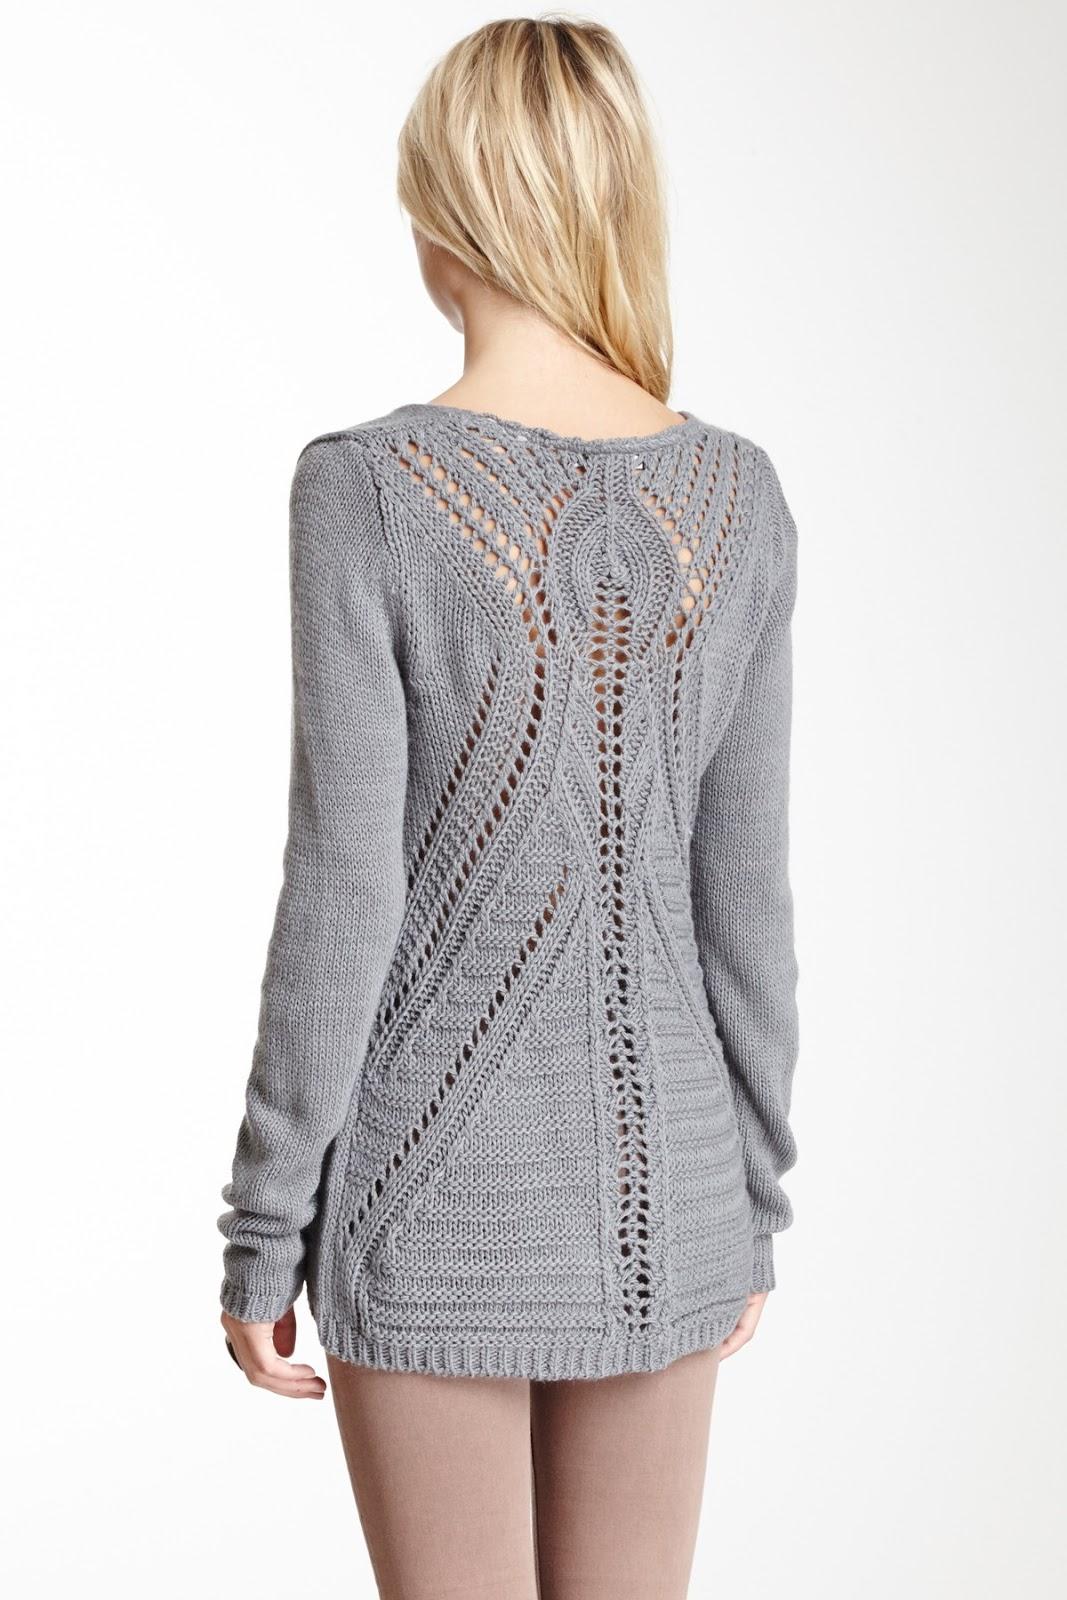 Ucd Sweater 80